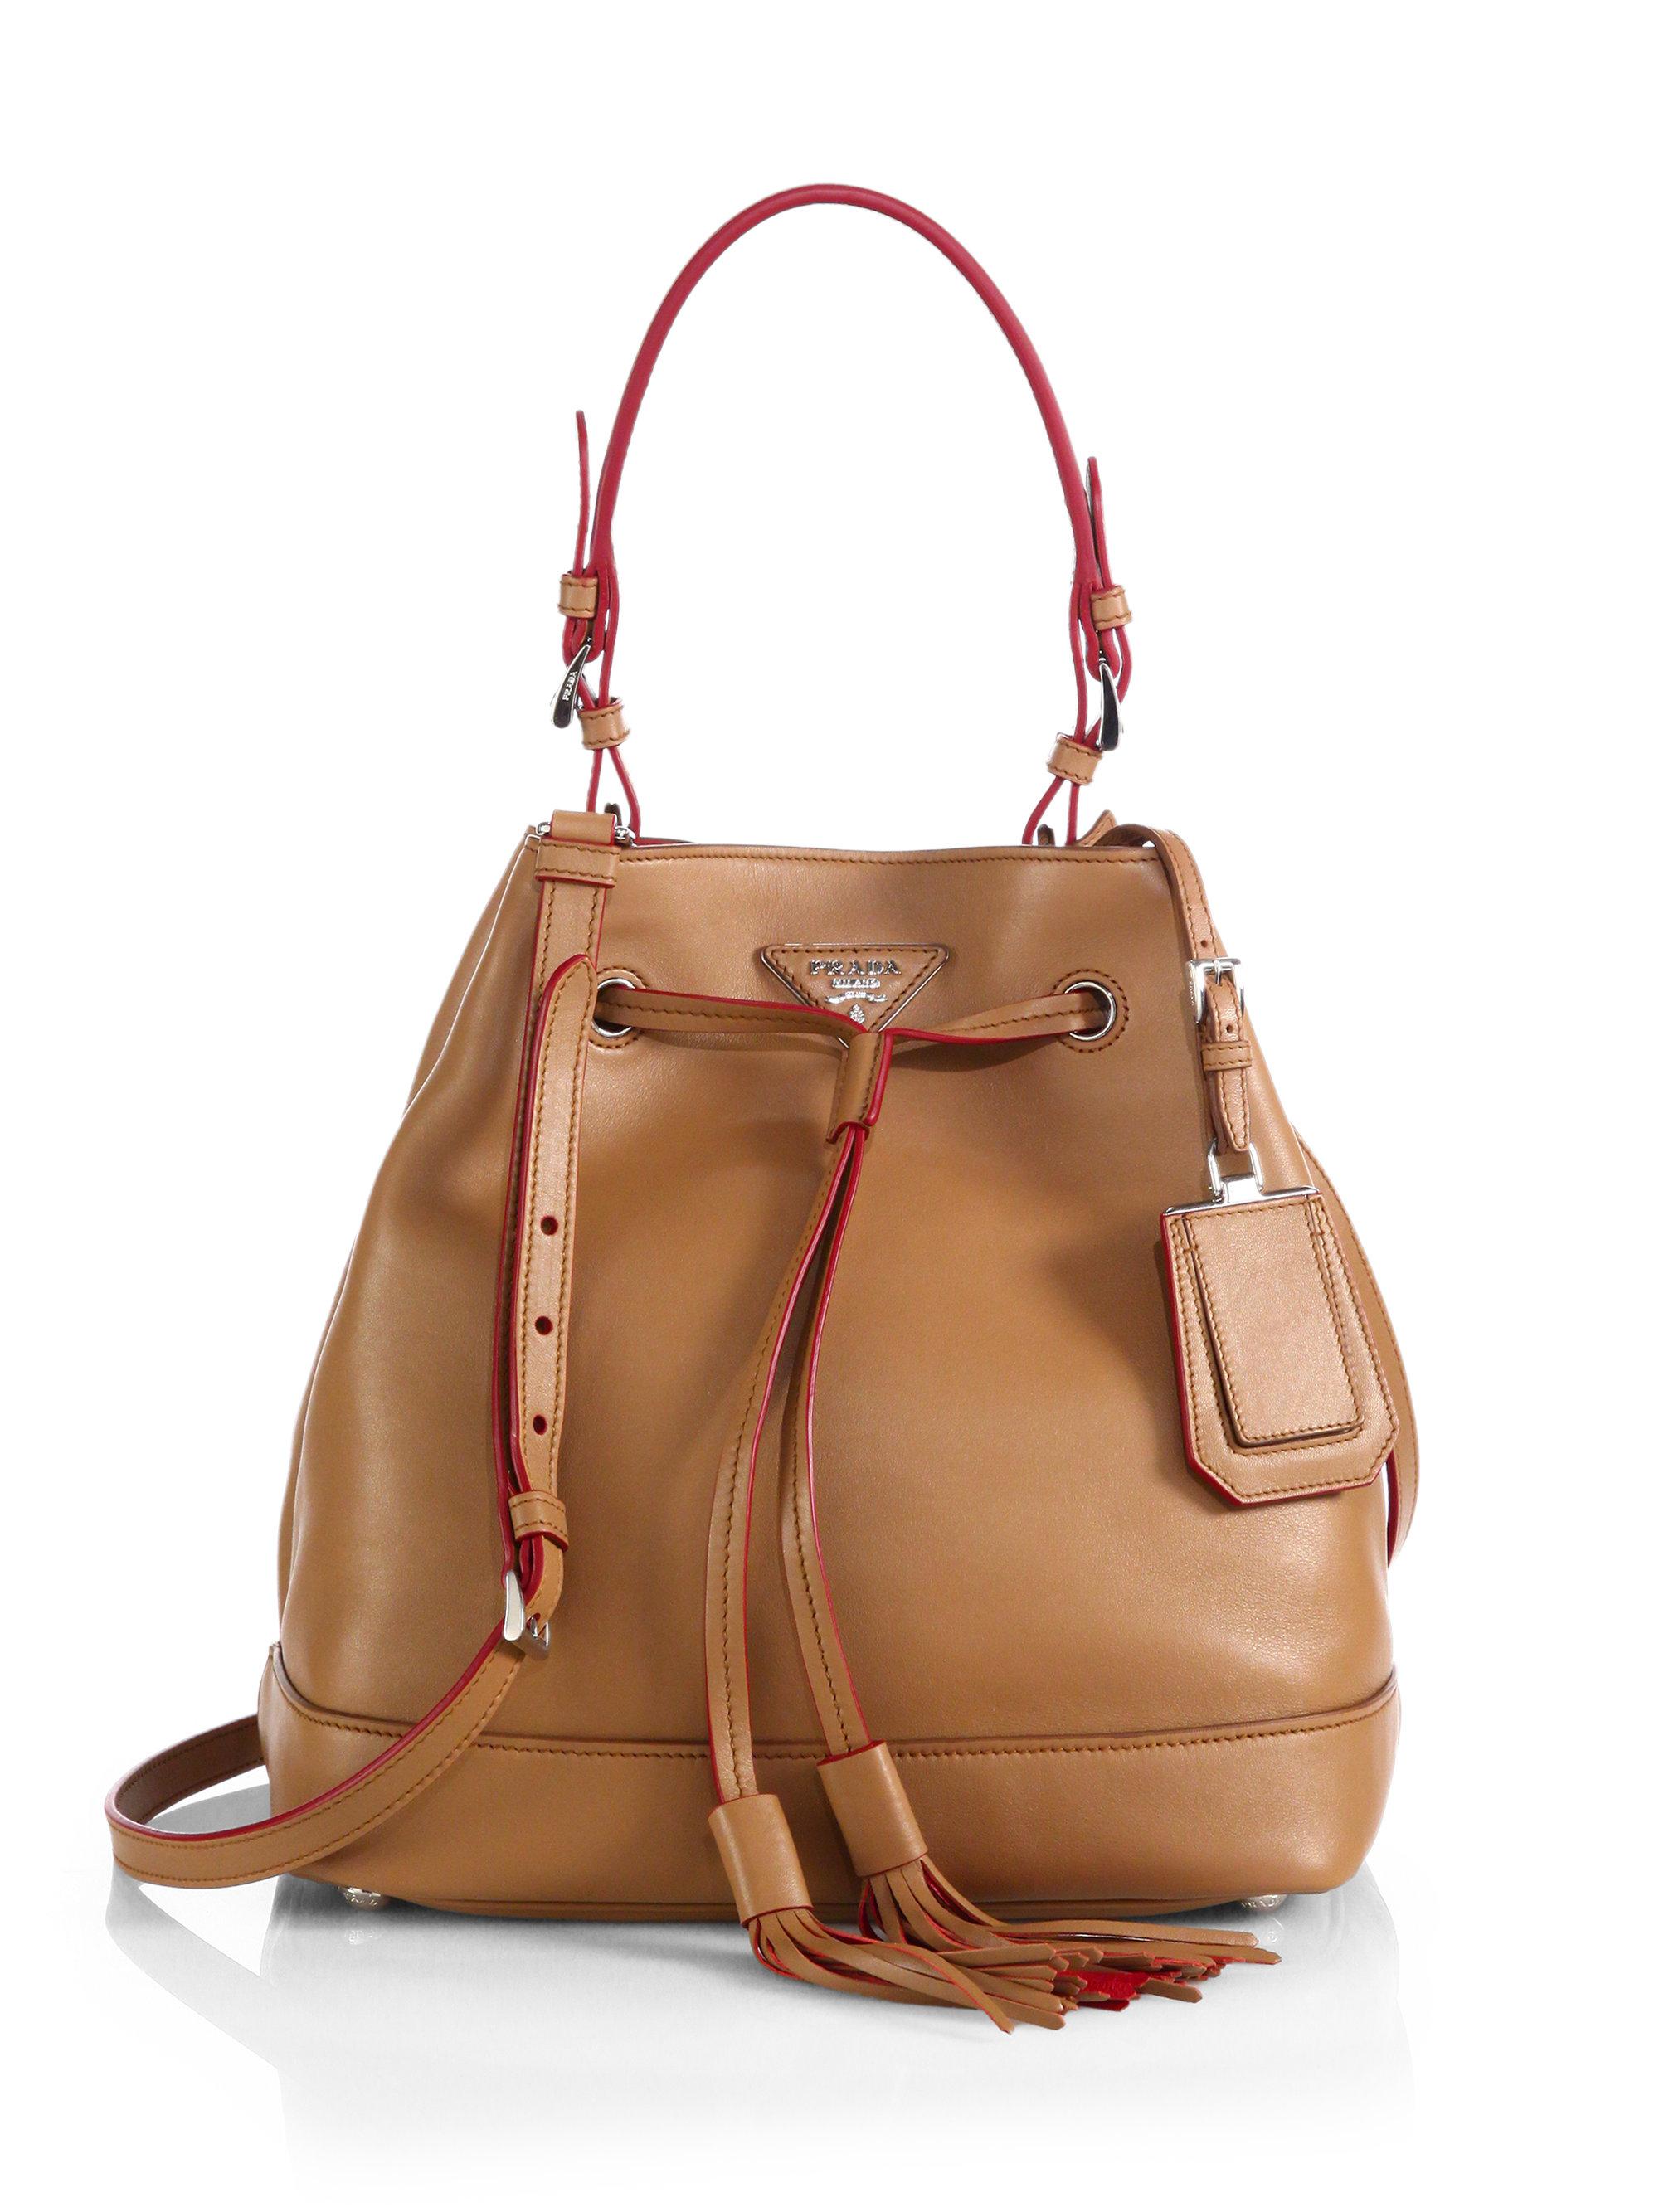 Prada Large Bucket Bag in Brown (CARAMELLO) | Lyst